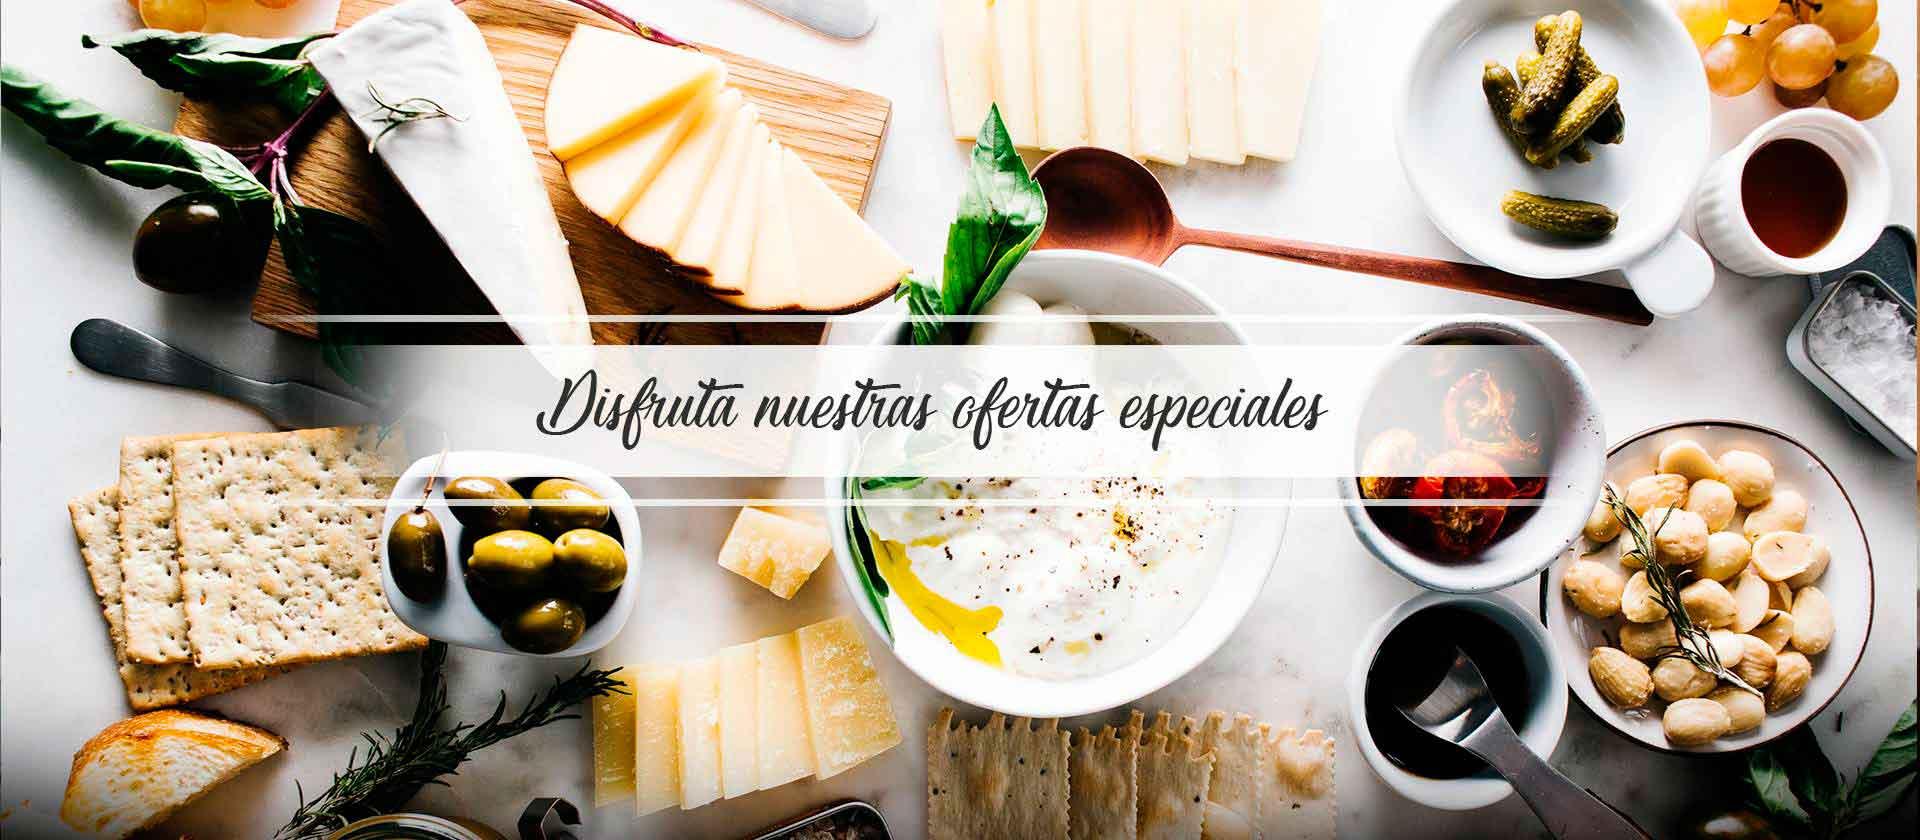 centraldelgourmet2 Tienda Gourmet Online | Productos Gourmet